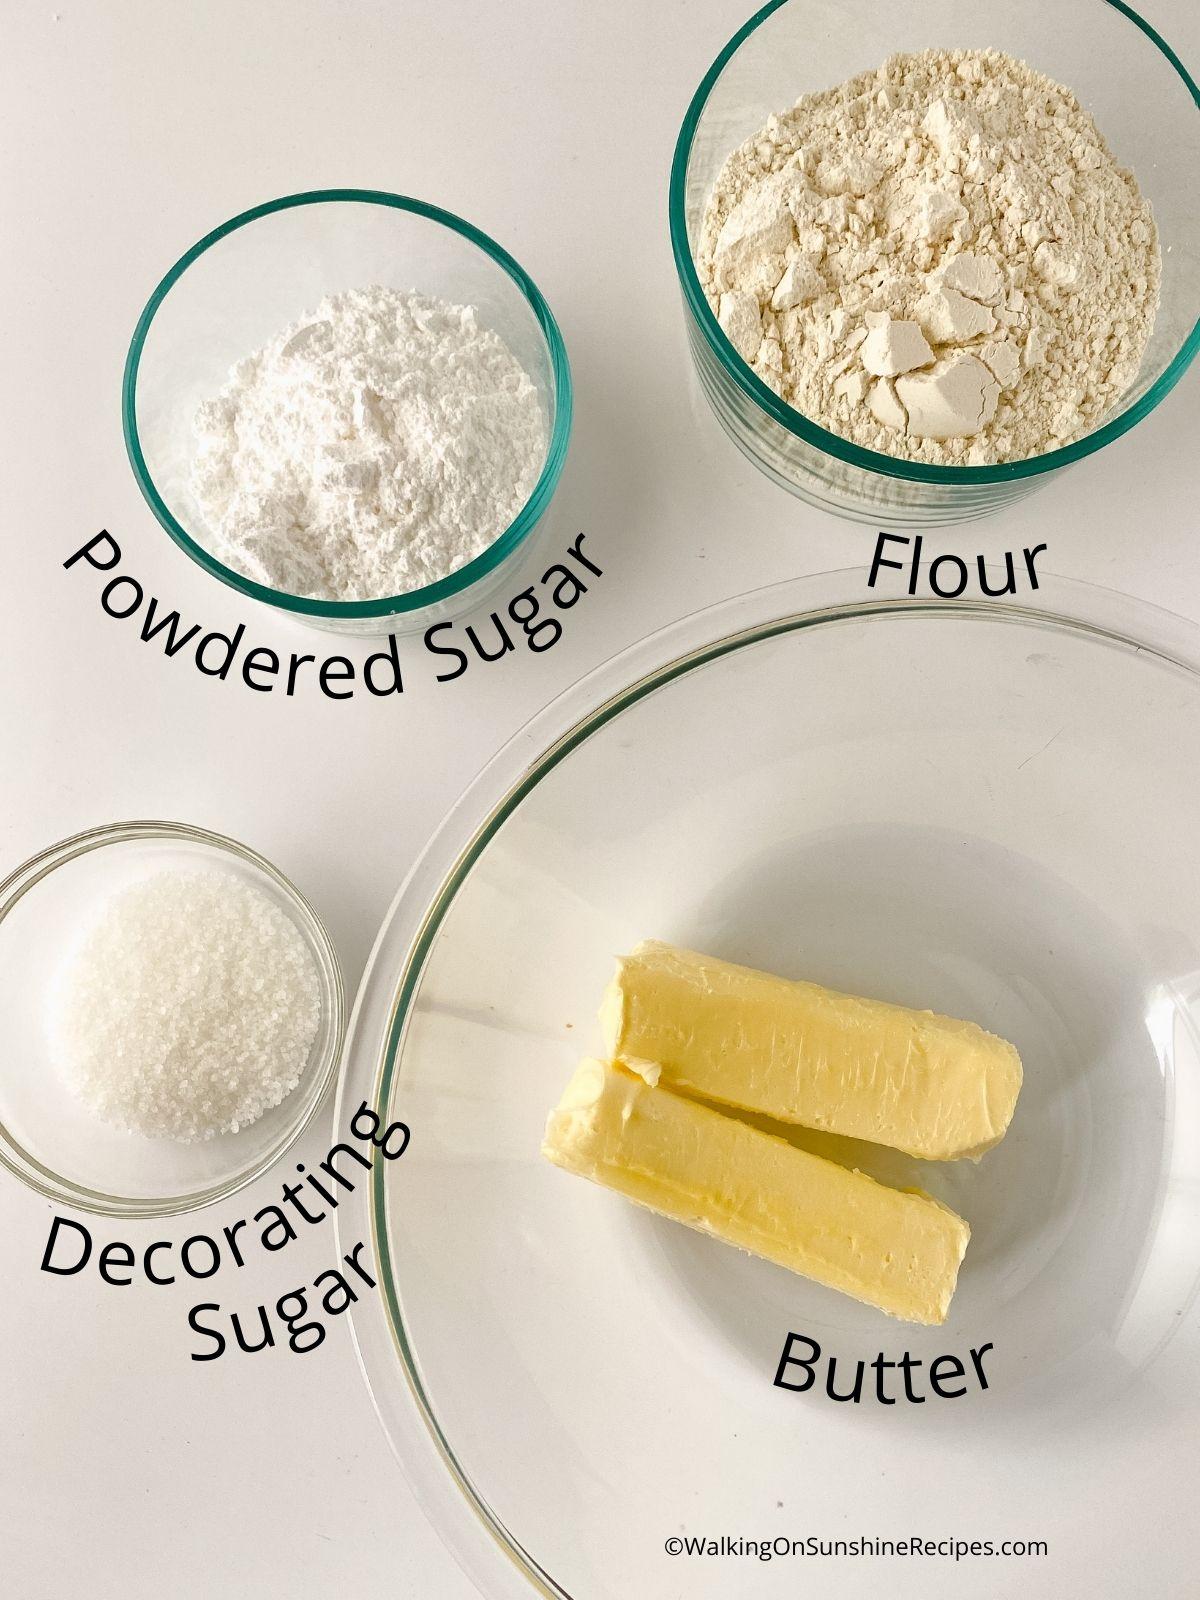 Shortbread ingredients.